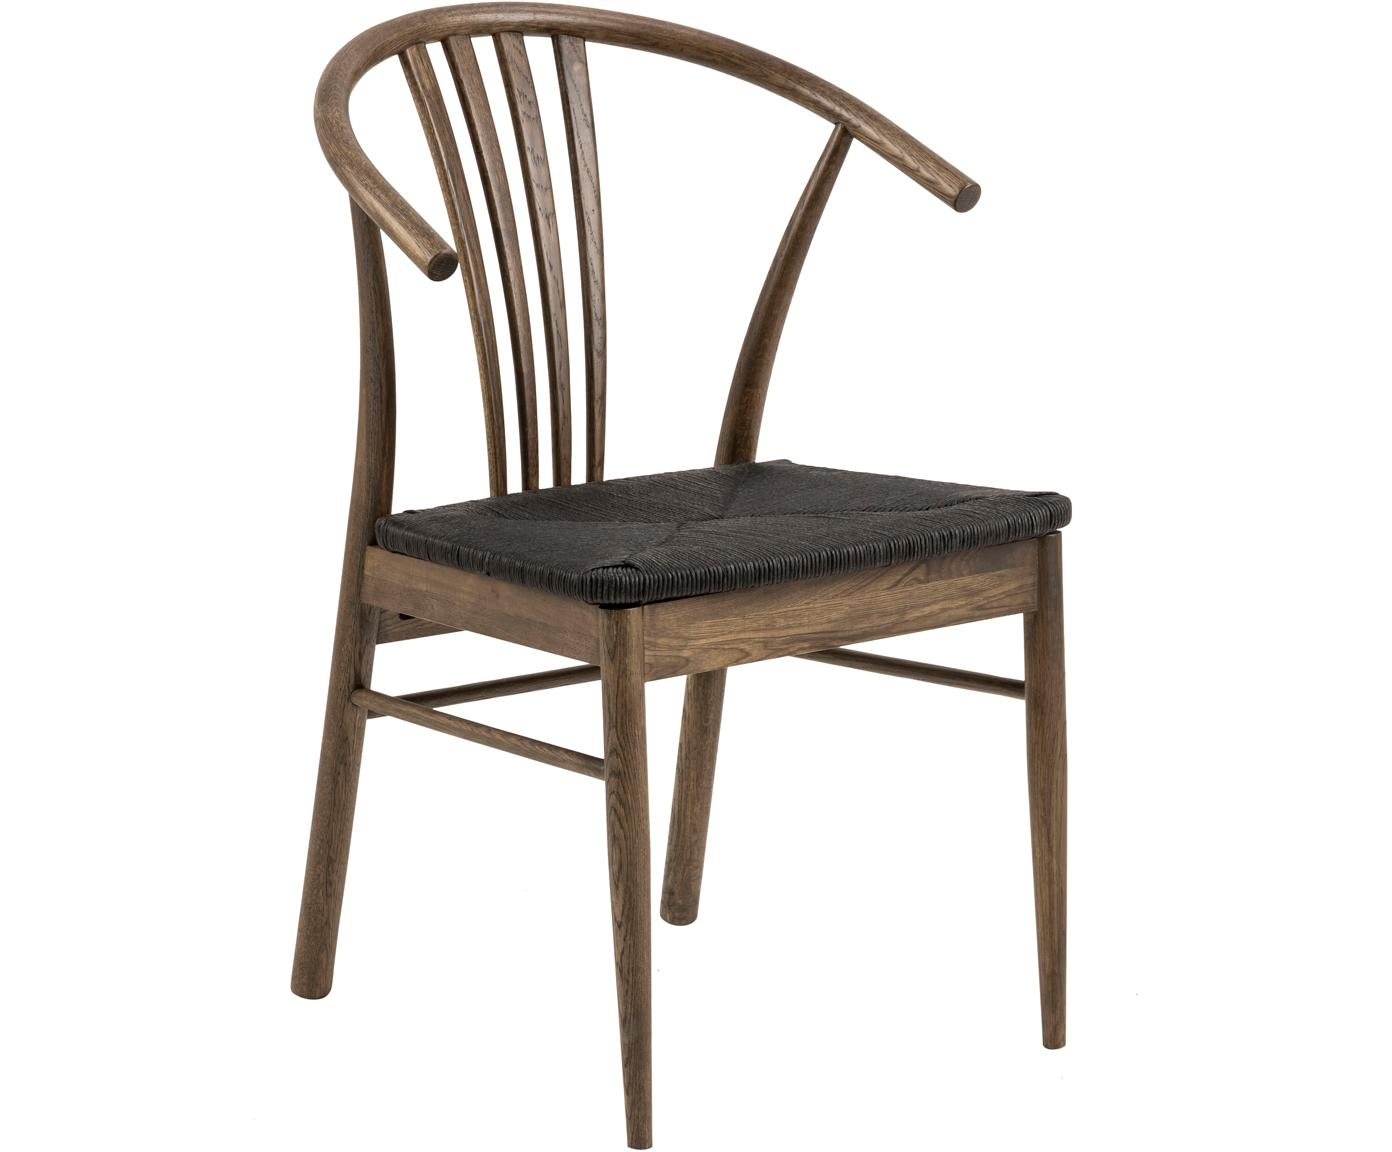 Silla con reposabrazos York, Estructura: madera de roble curtida, Asiento: cuerda trenzada, Negro, marrón oscuro, An 54 x F 54 cm